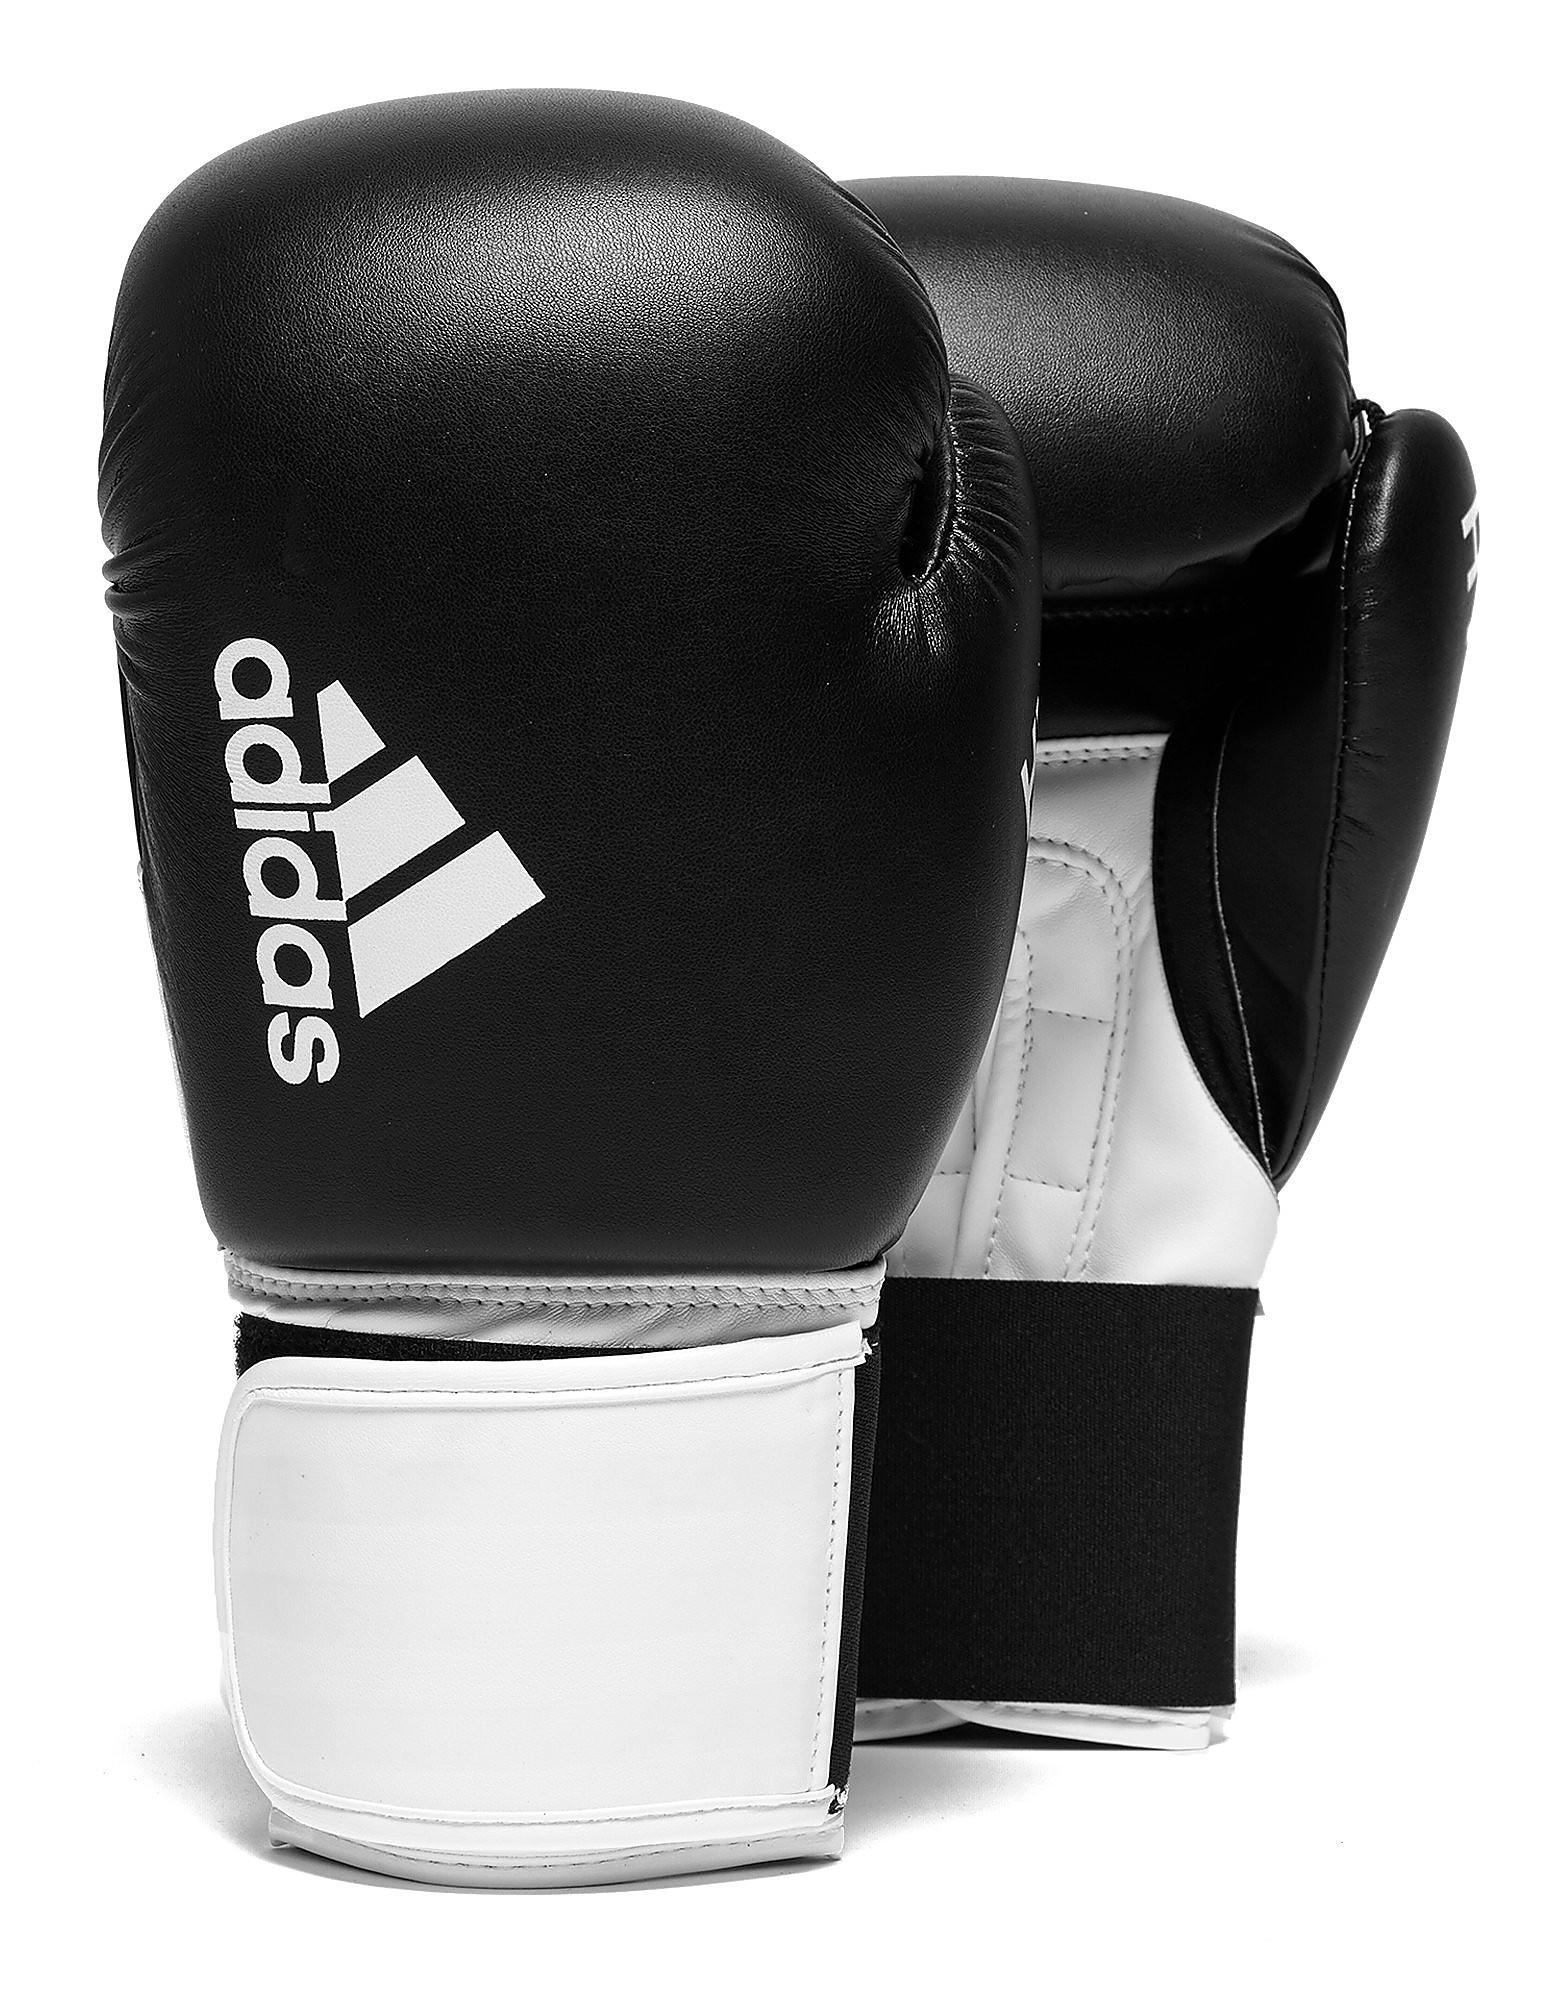 adidas Hybrid 100 Boxing Gloves